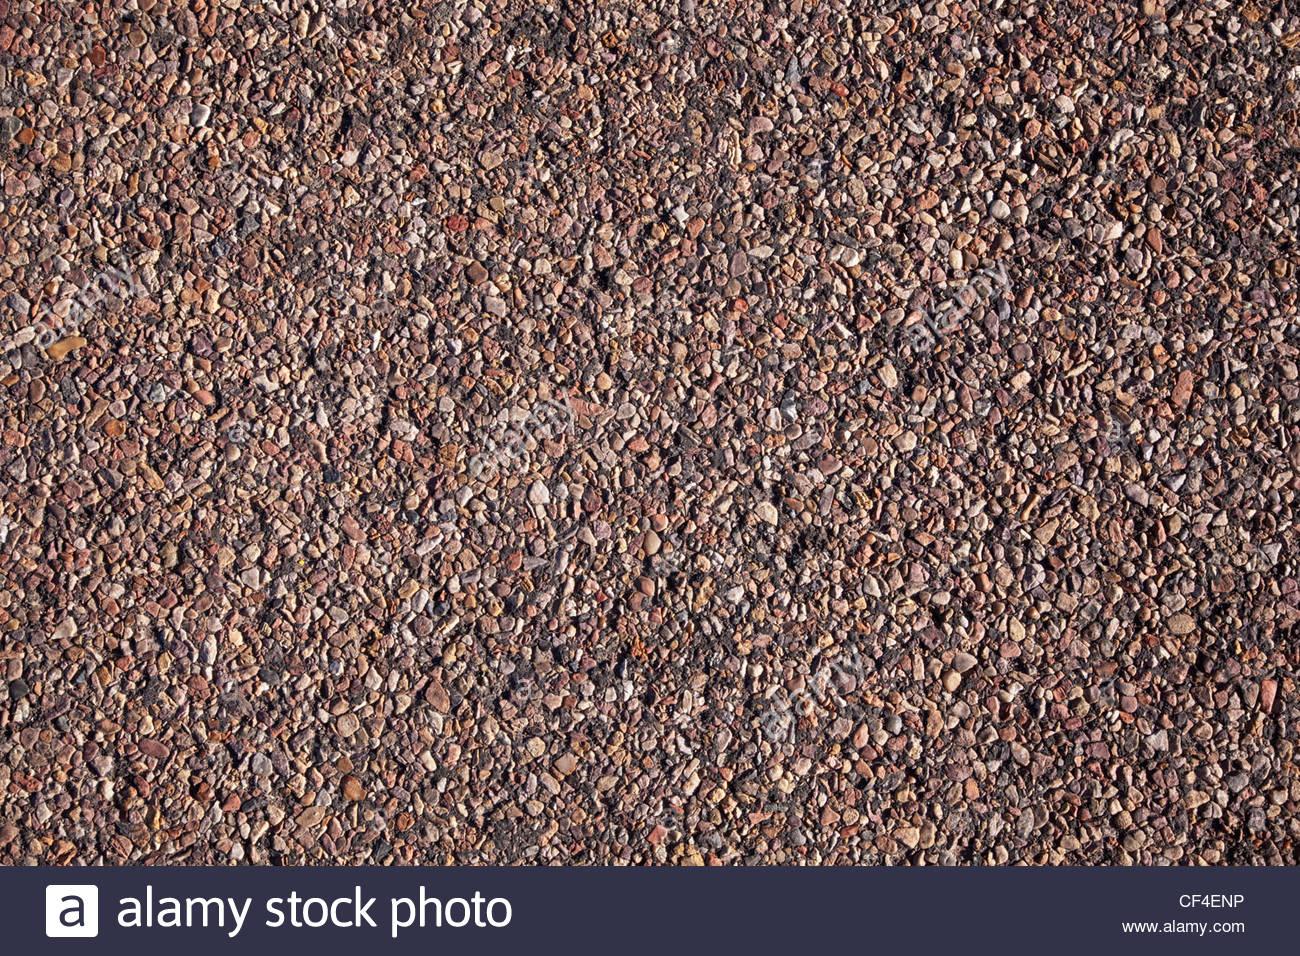 Grava fina en la textura del fondo de asfalto en la superficie de la carretera Arizona Imagen De Stock